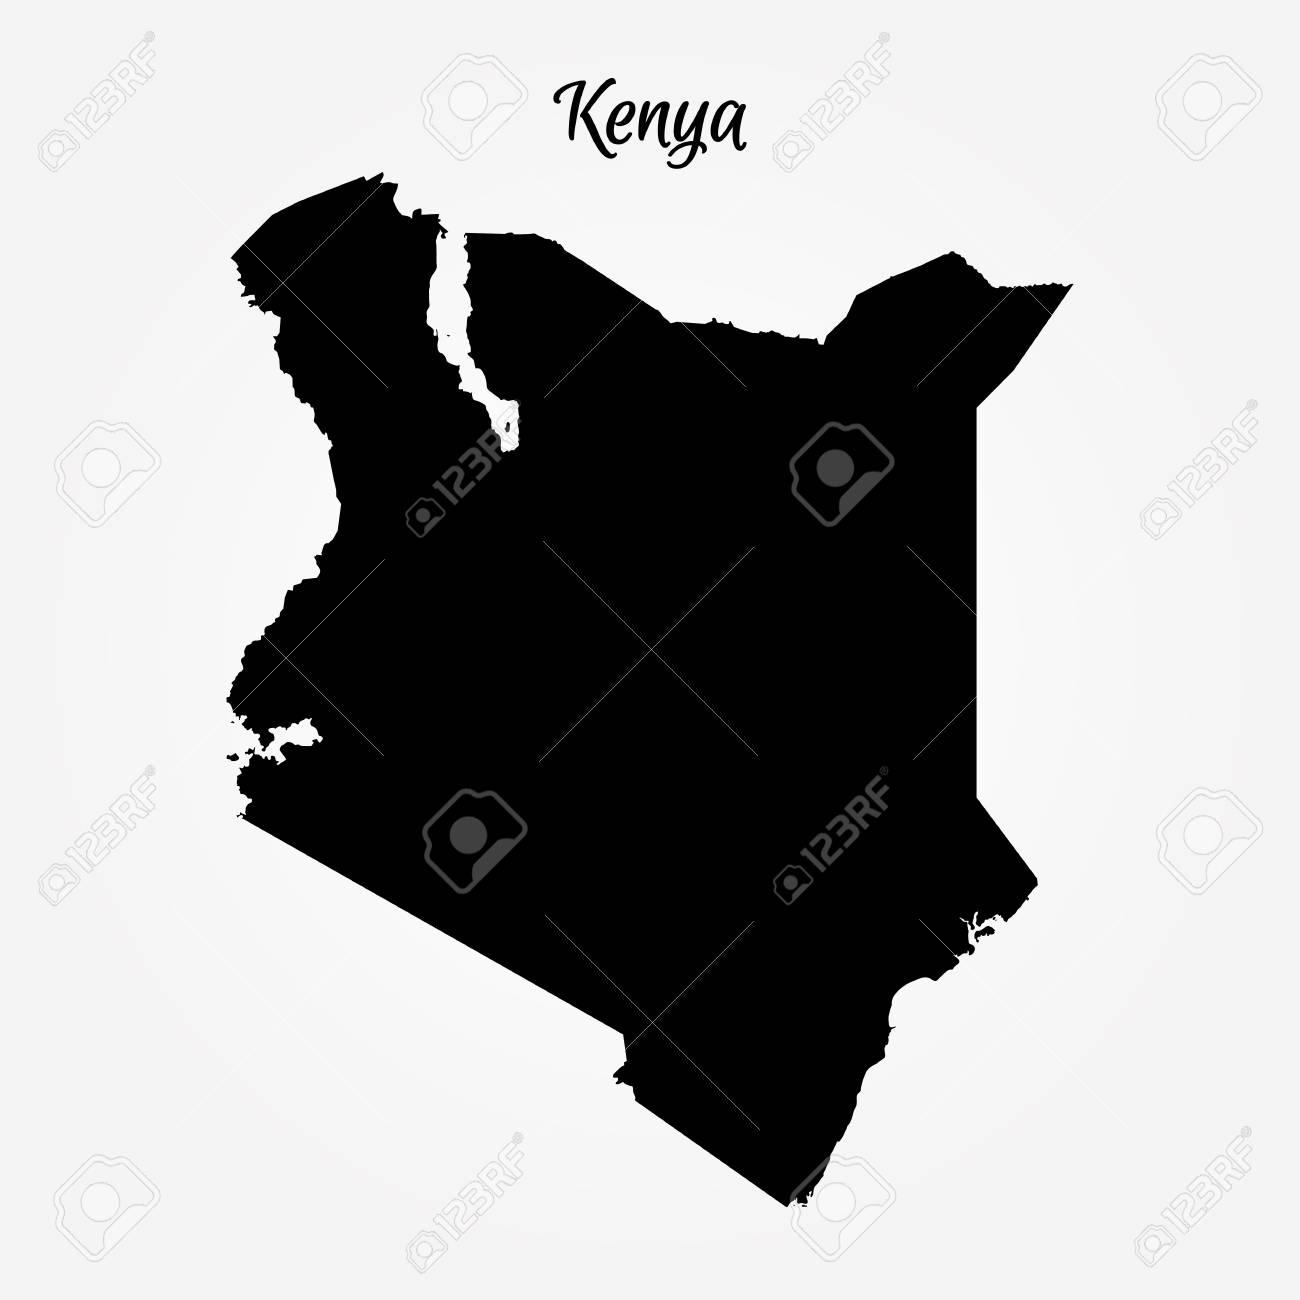 Map of kenya vector illustration world map royalty free cliparts map of kenya vector illustration world map stock vector 94259978 gumiabroncs Choice Image